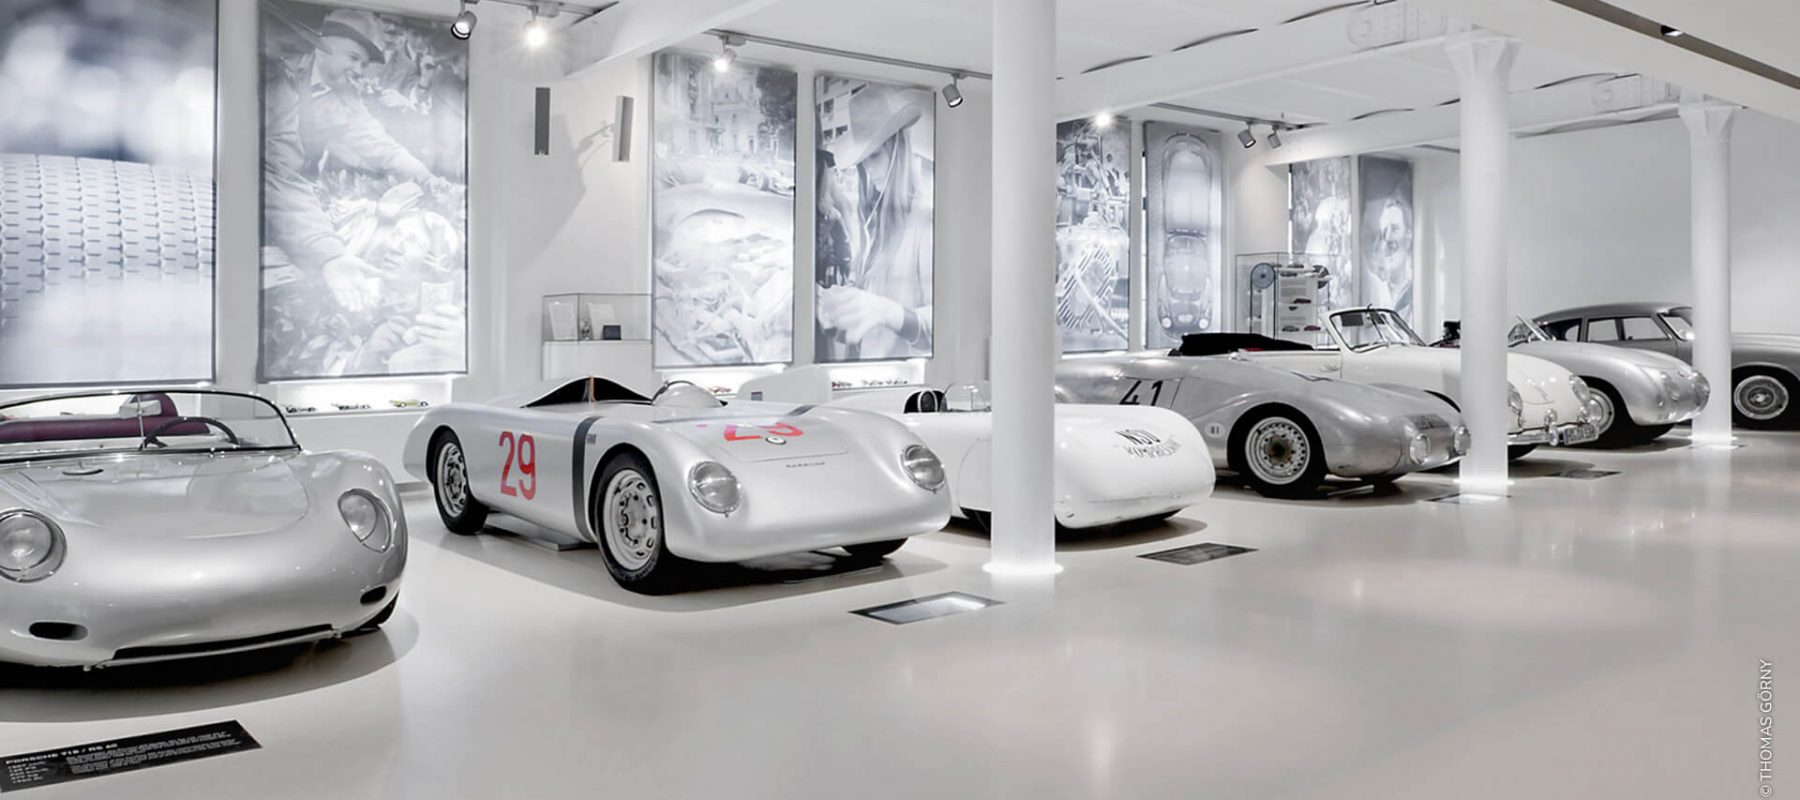 Dauerausstellung Automuseum Prototyp, Hamburg - Copyright Thomas Görny